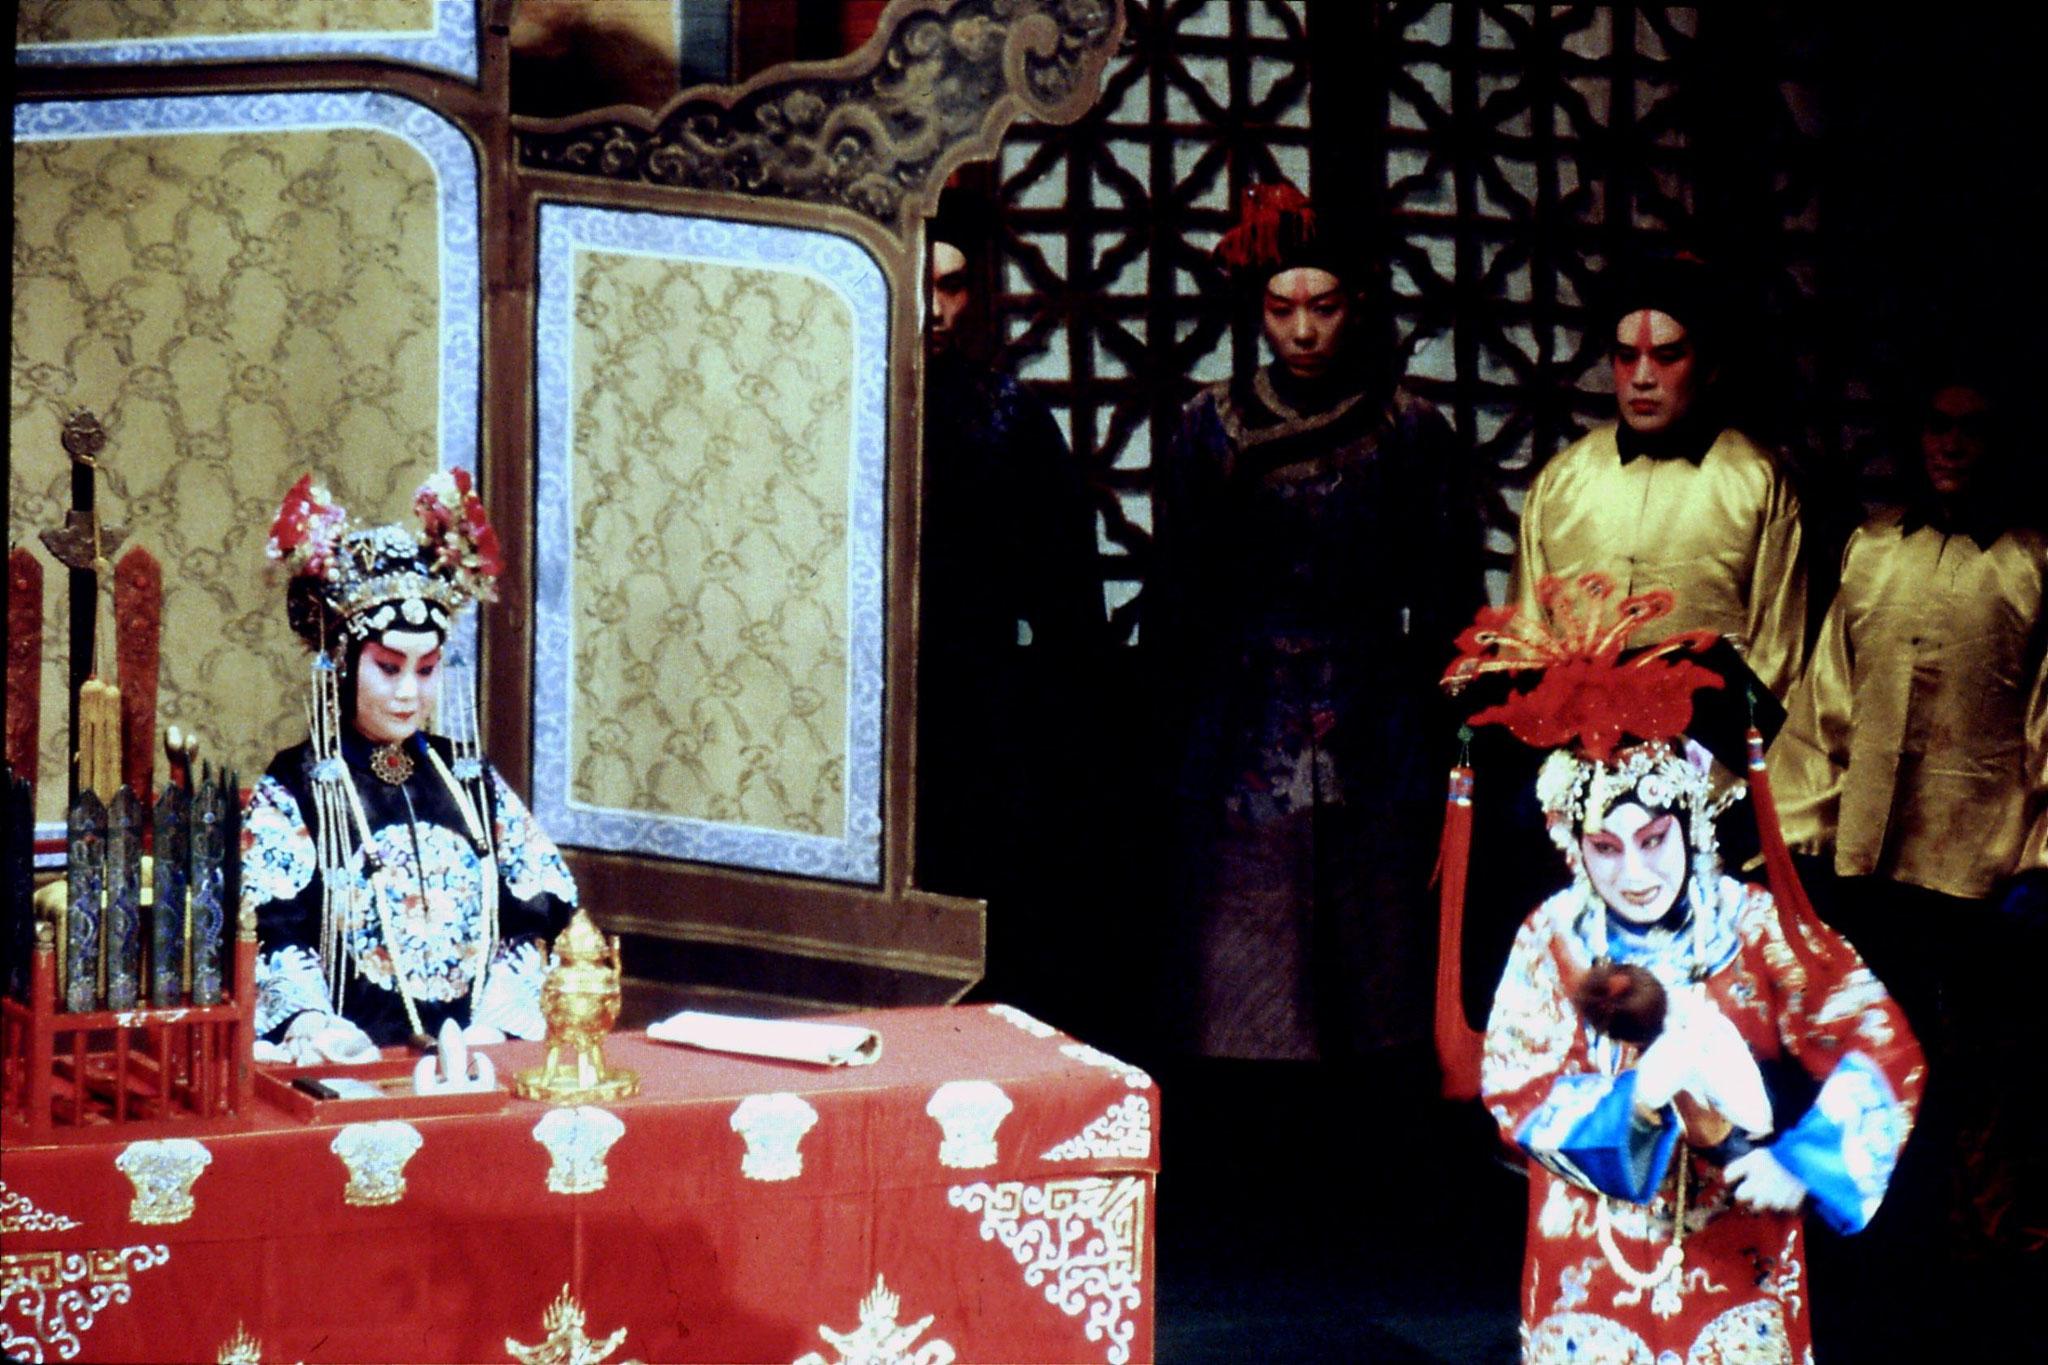 17/3/1989: 12: Chang'an opera